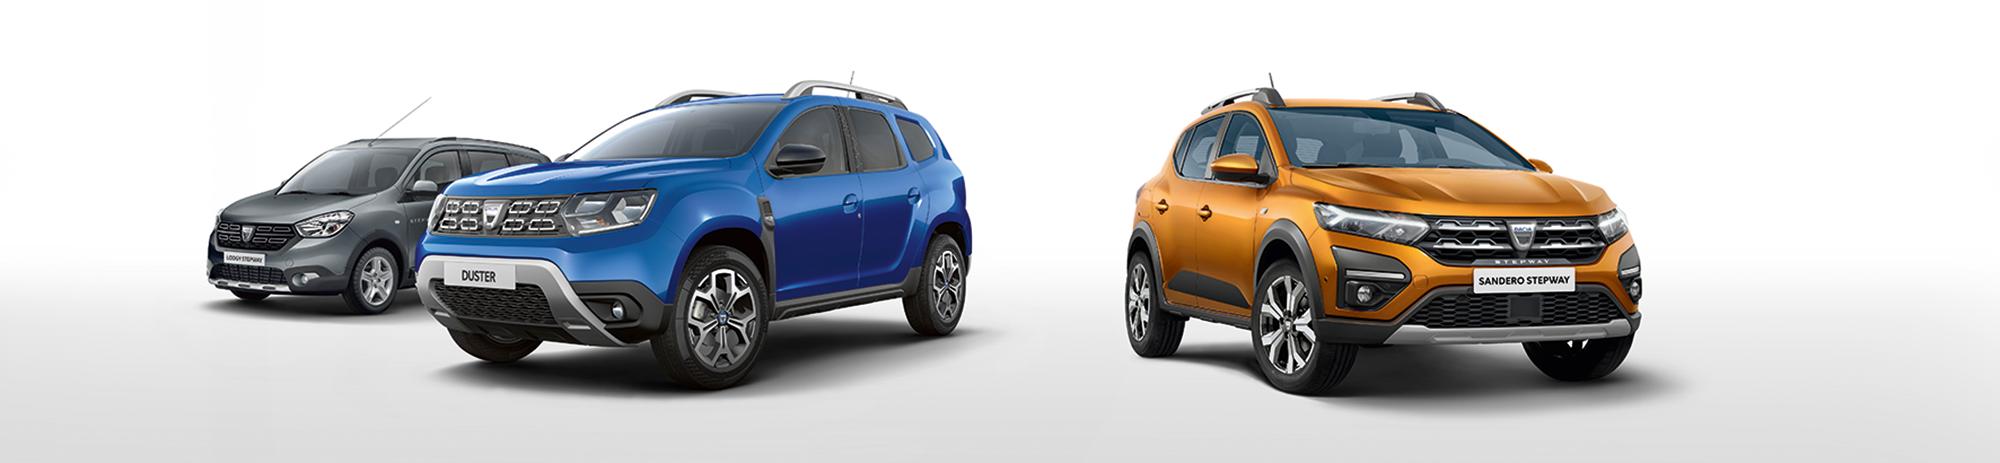 Dacia-Fahrzeugmodelle